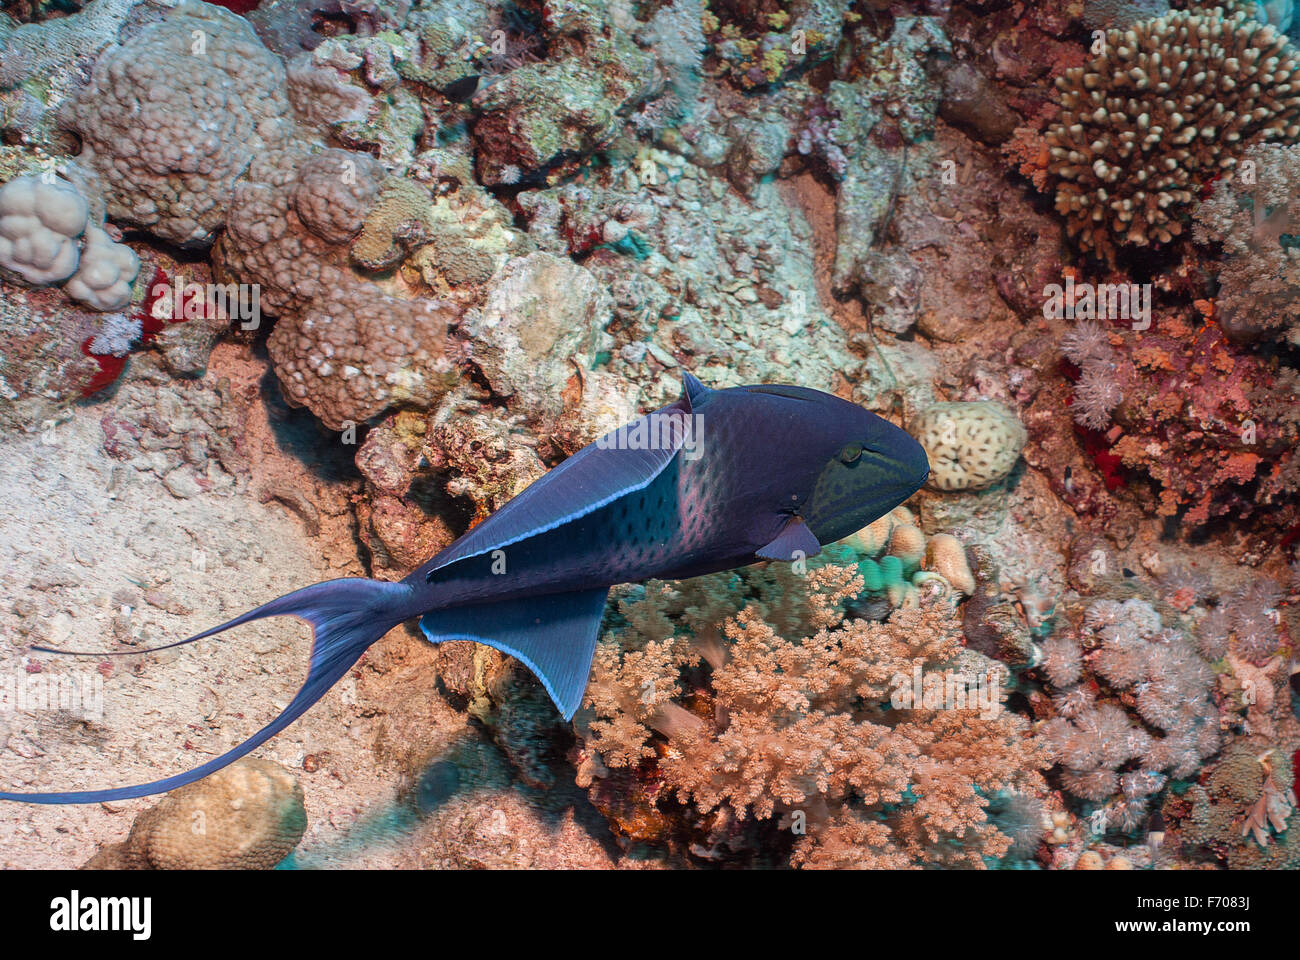 Redtooth Triggerfish, Odonus niger, Balestidae, Red Sea, Sharm el-Sheikh, Egypt - Stock Image